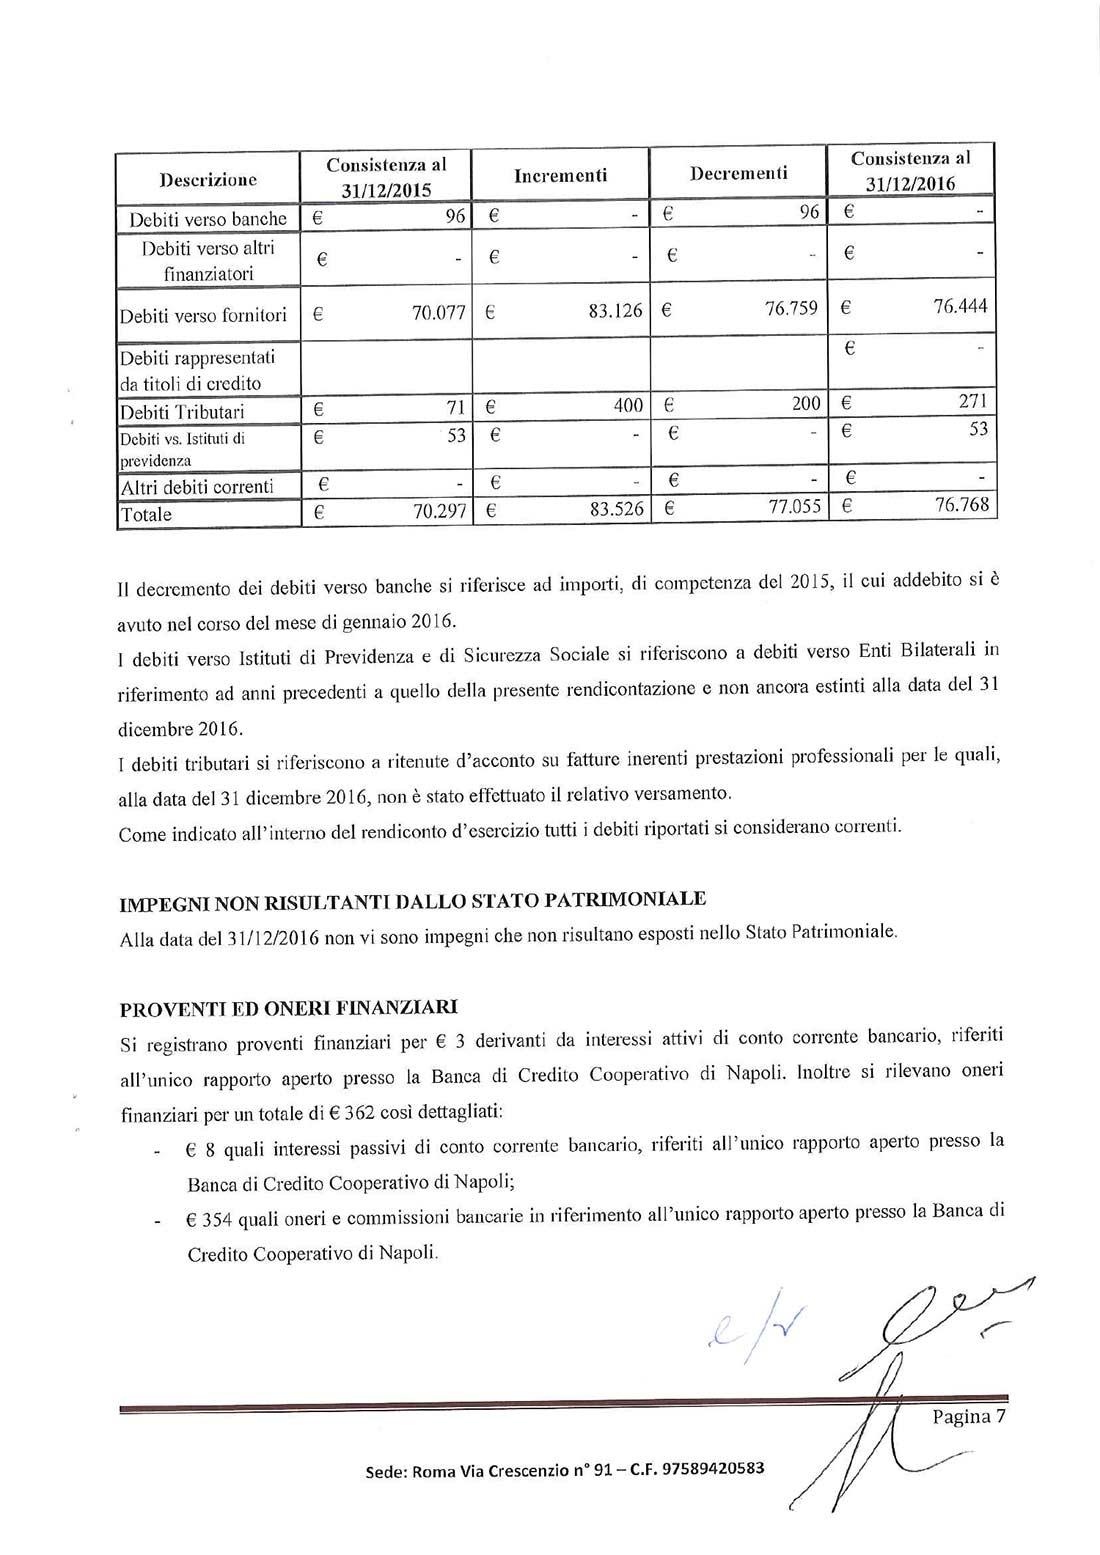 Nota_integrativa_2016-7